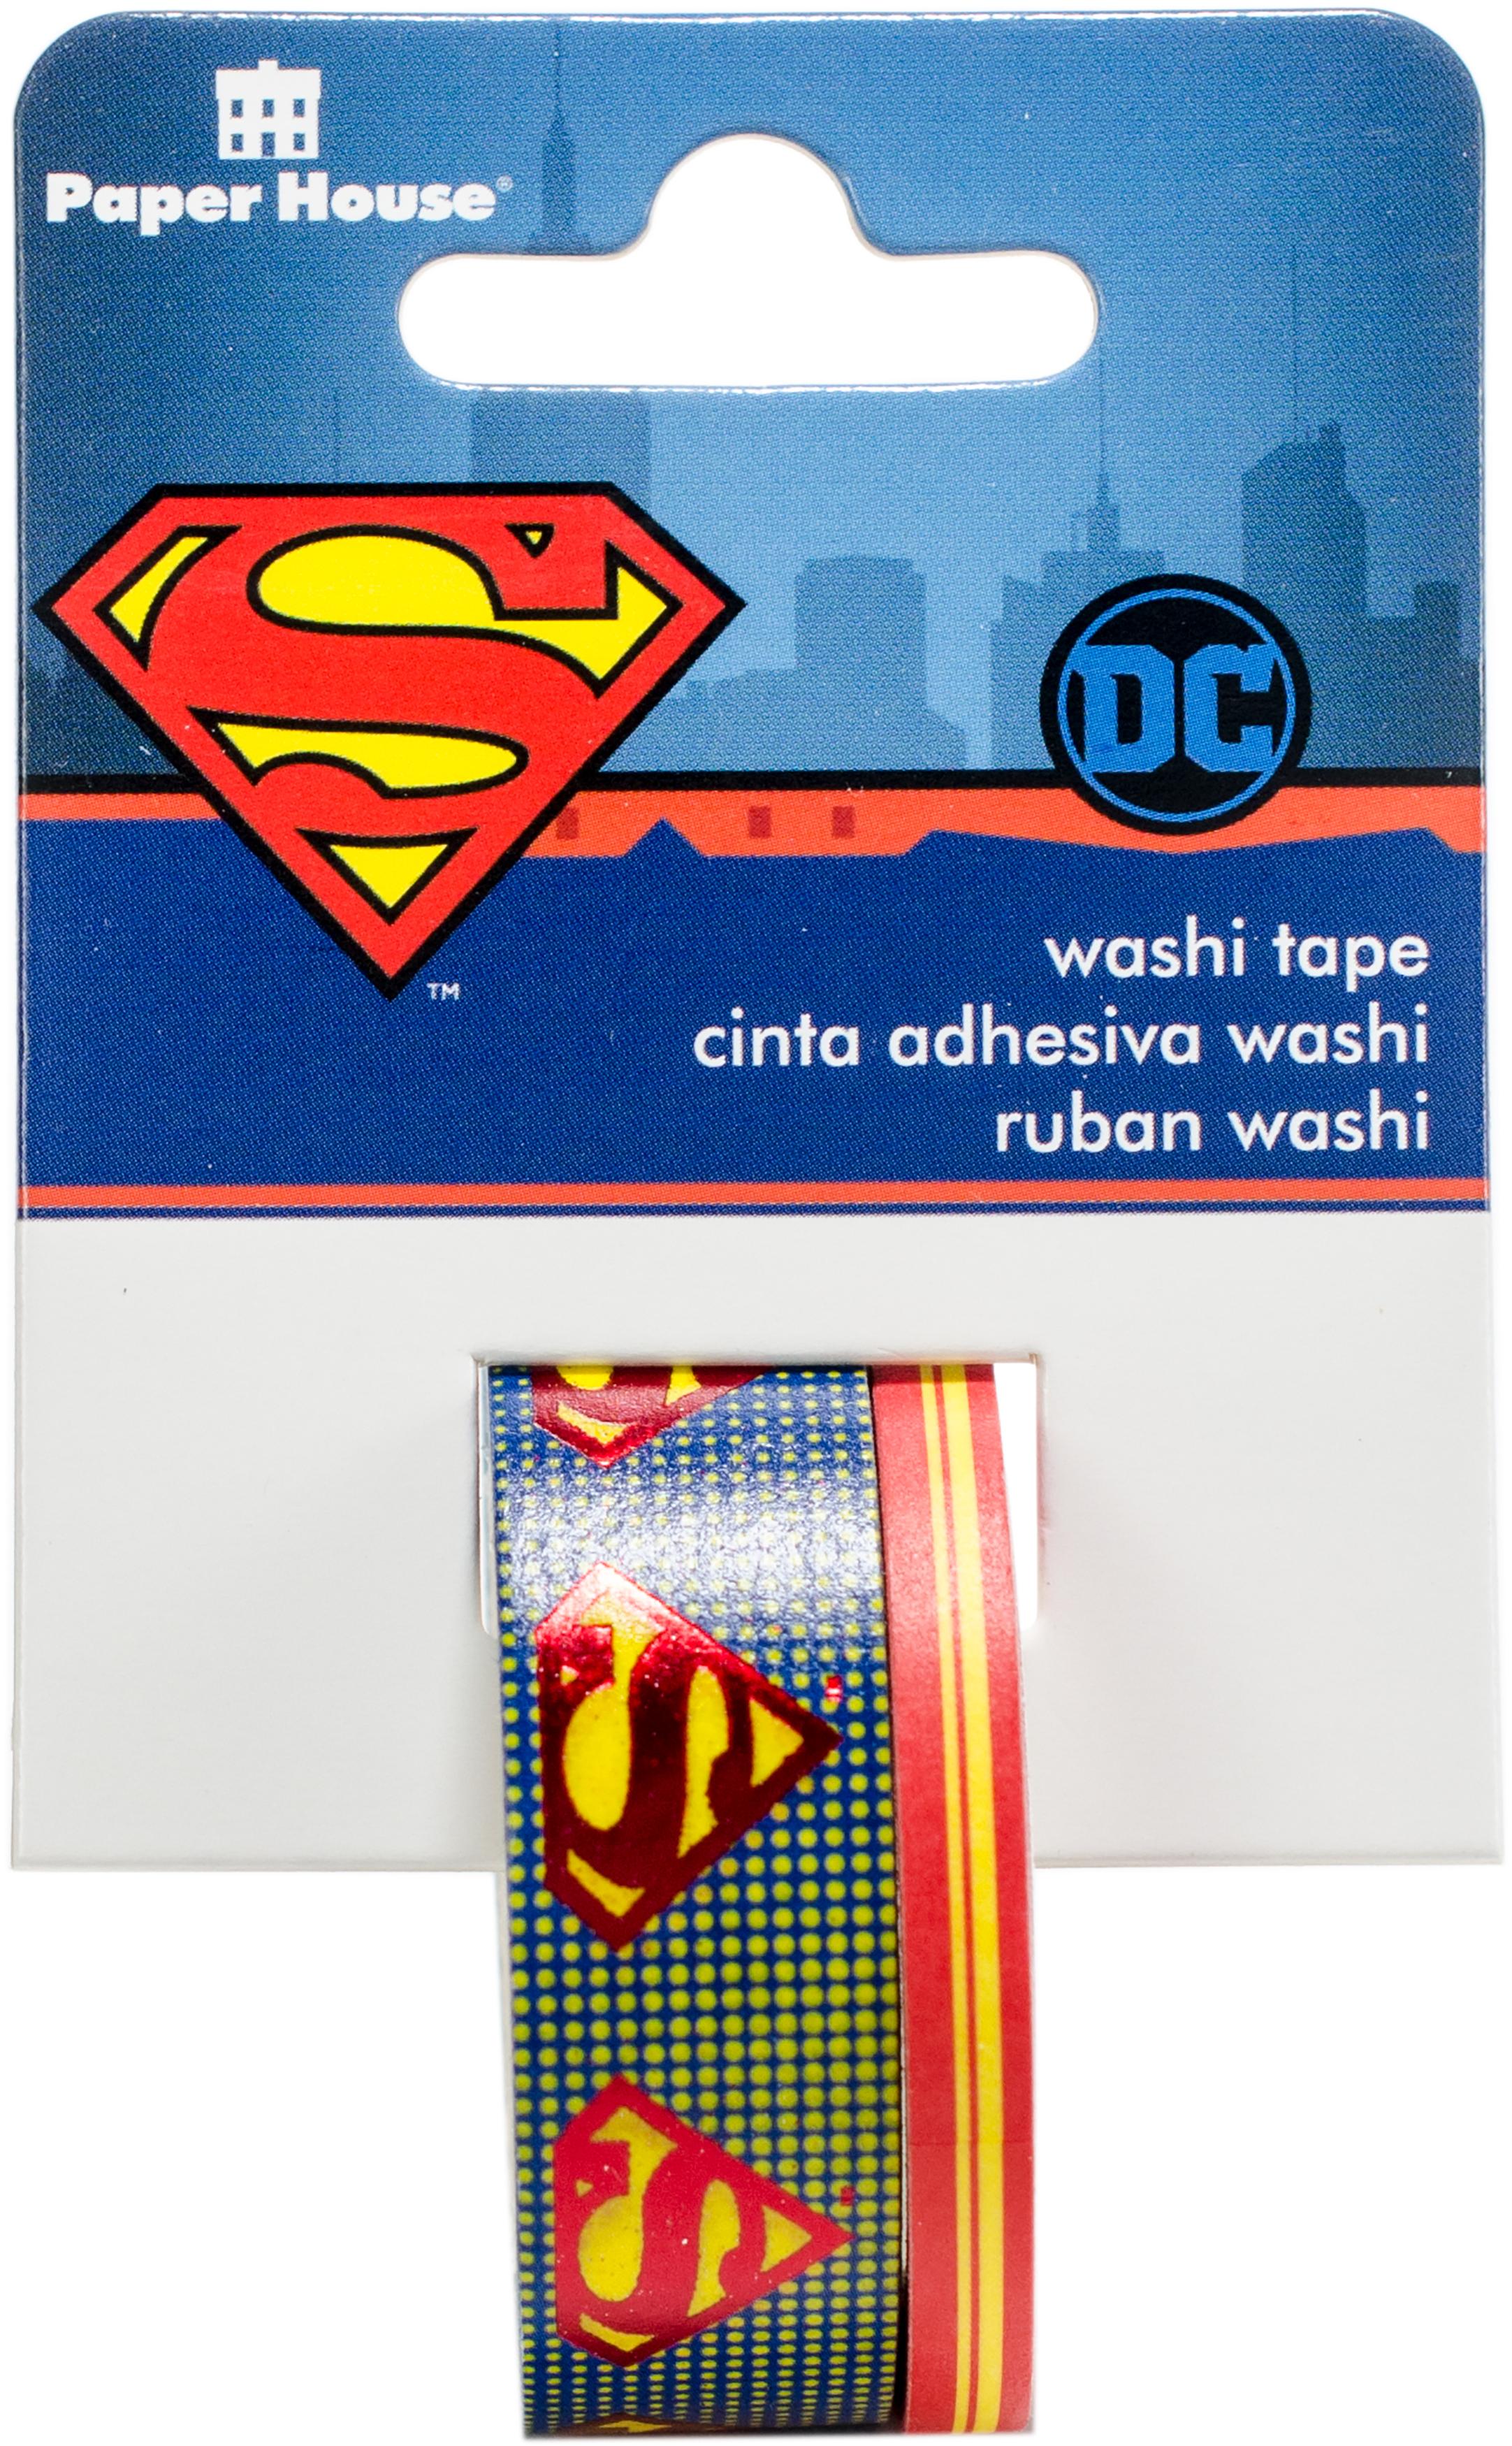 Paper House Washi Tape 2/Pkg-Superman Logo, 15mmx10m and 5mmx10m